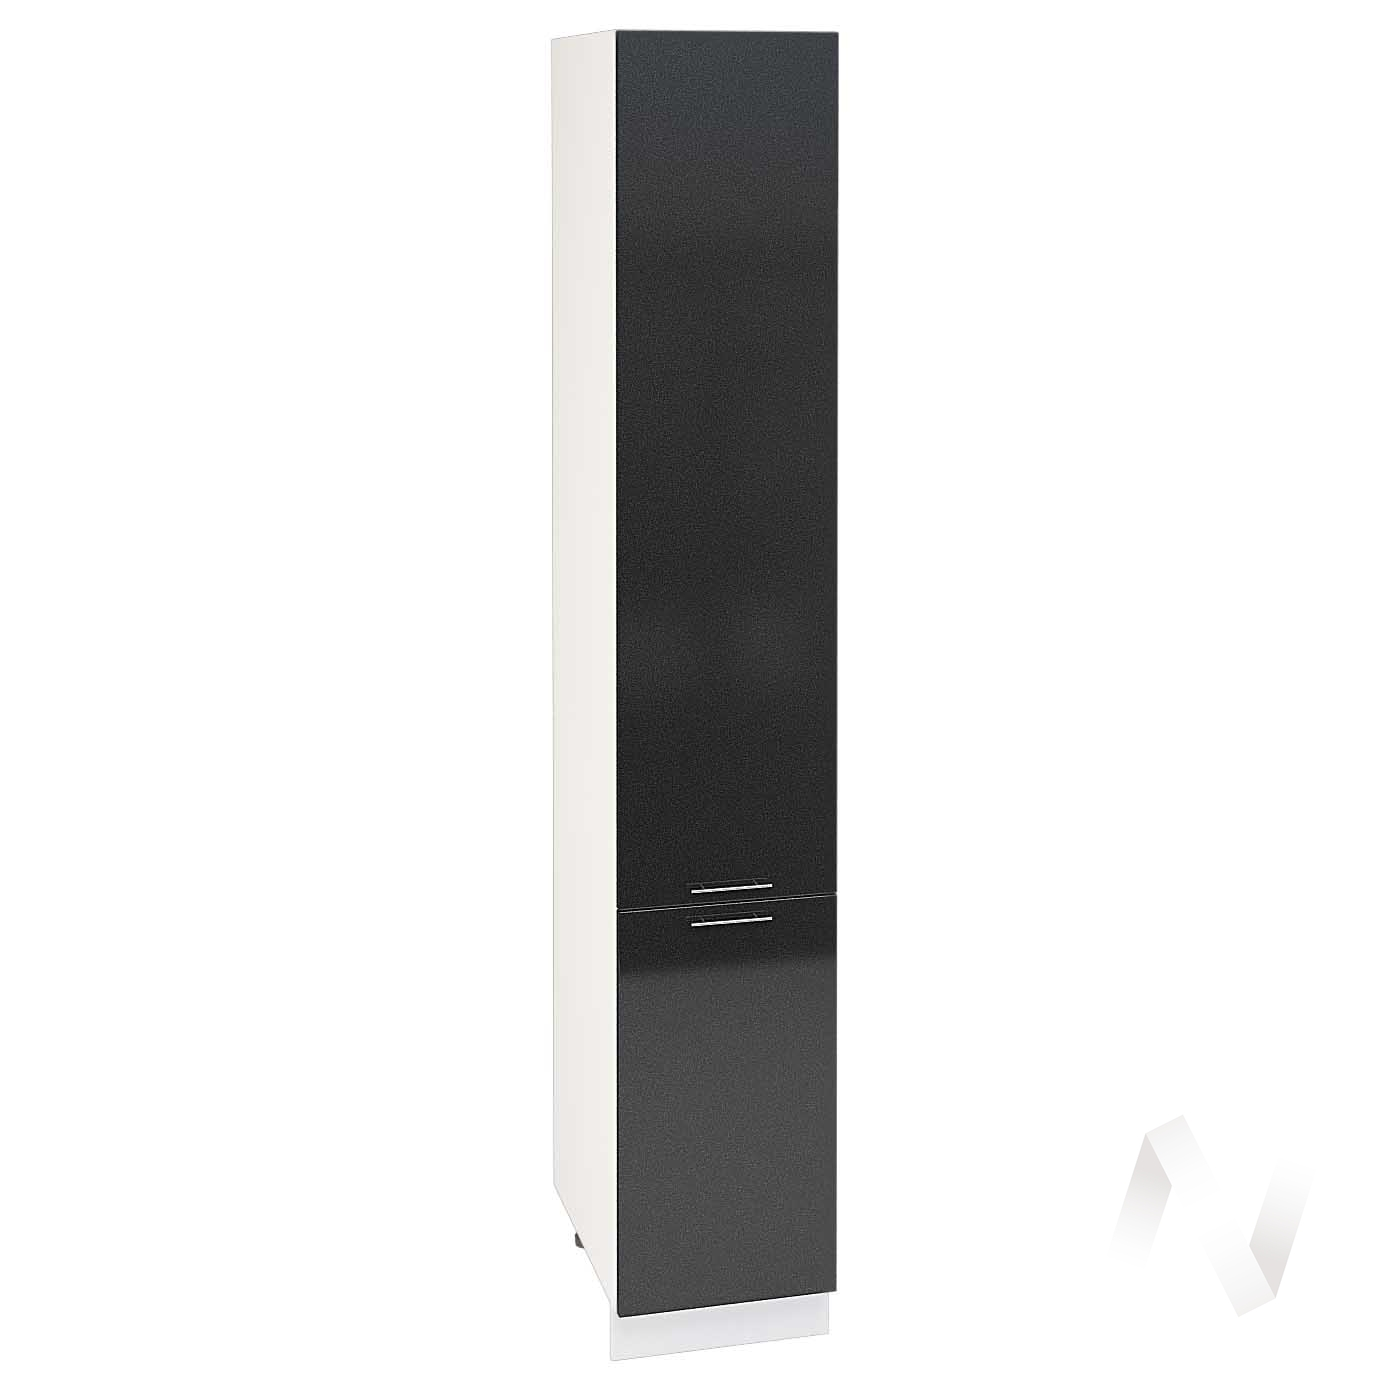 "Кухня ""Валерия-М"": Шкаф пенал 400, ШП 400 Н (черный металлик/корпус белый)"